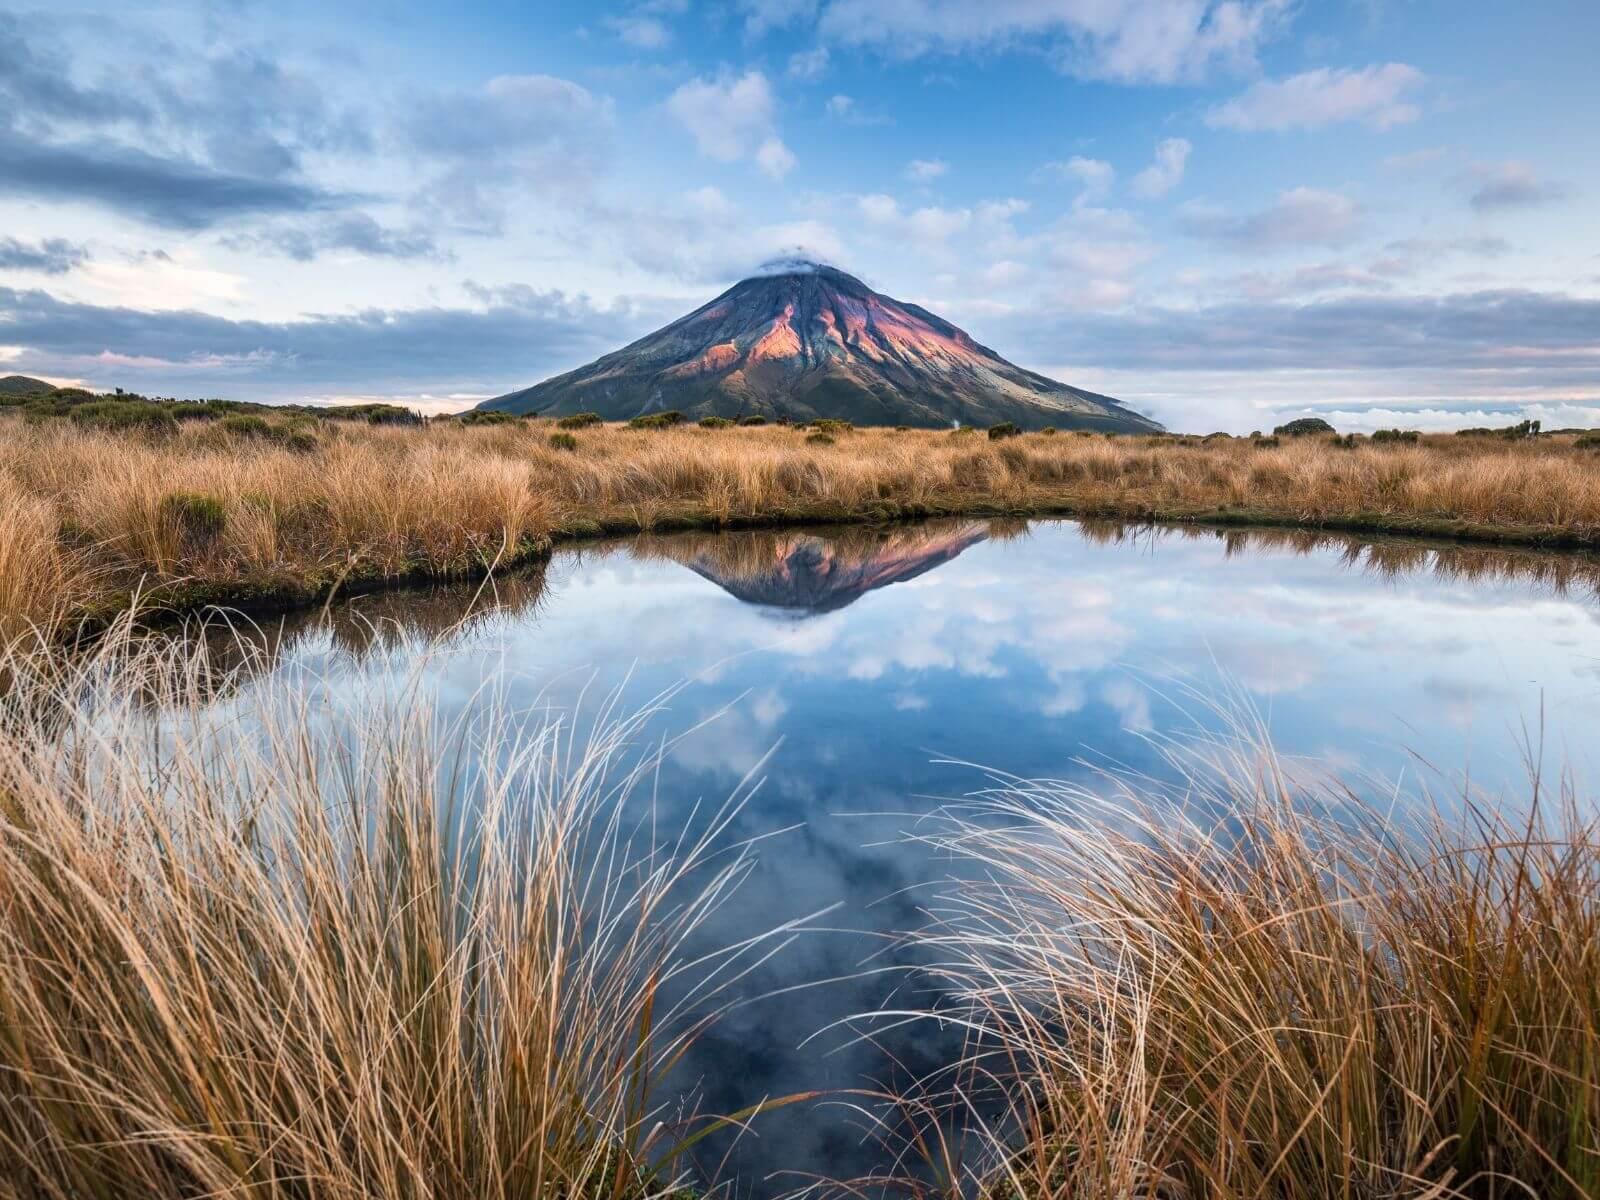 Beste daghikes Noordereiland Nieuw-Zeeland - Pouakai Crossing